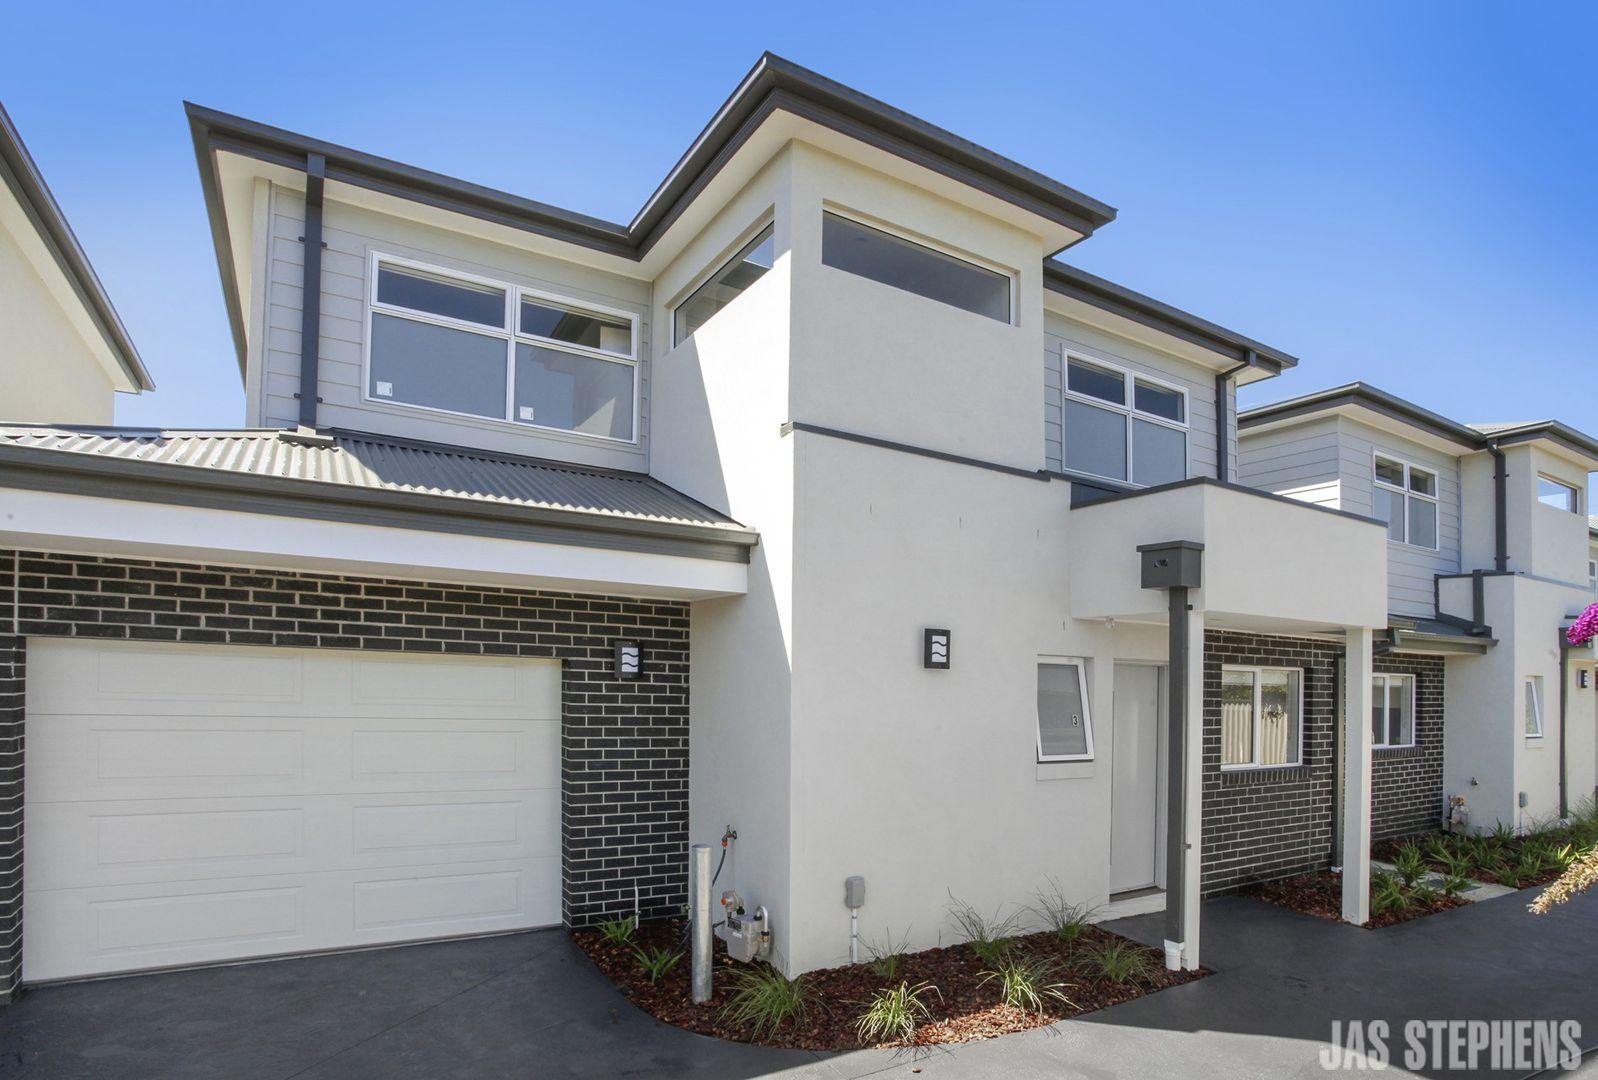 3/66 Roberts Street, West Footscray VIC 3012, Image 1